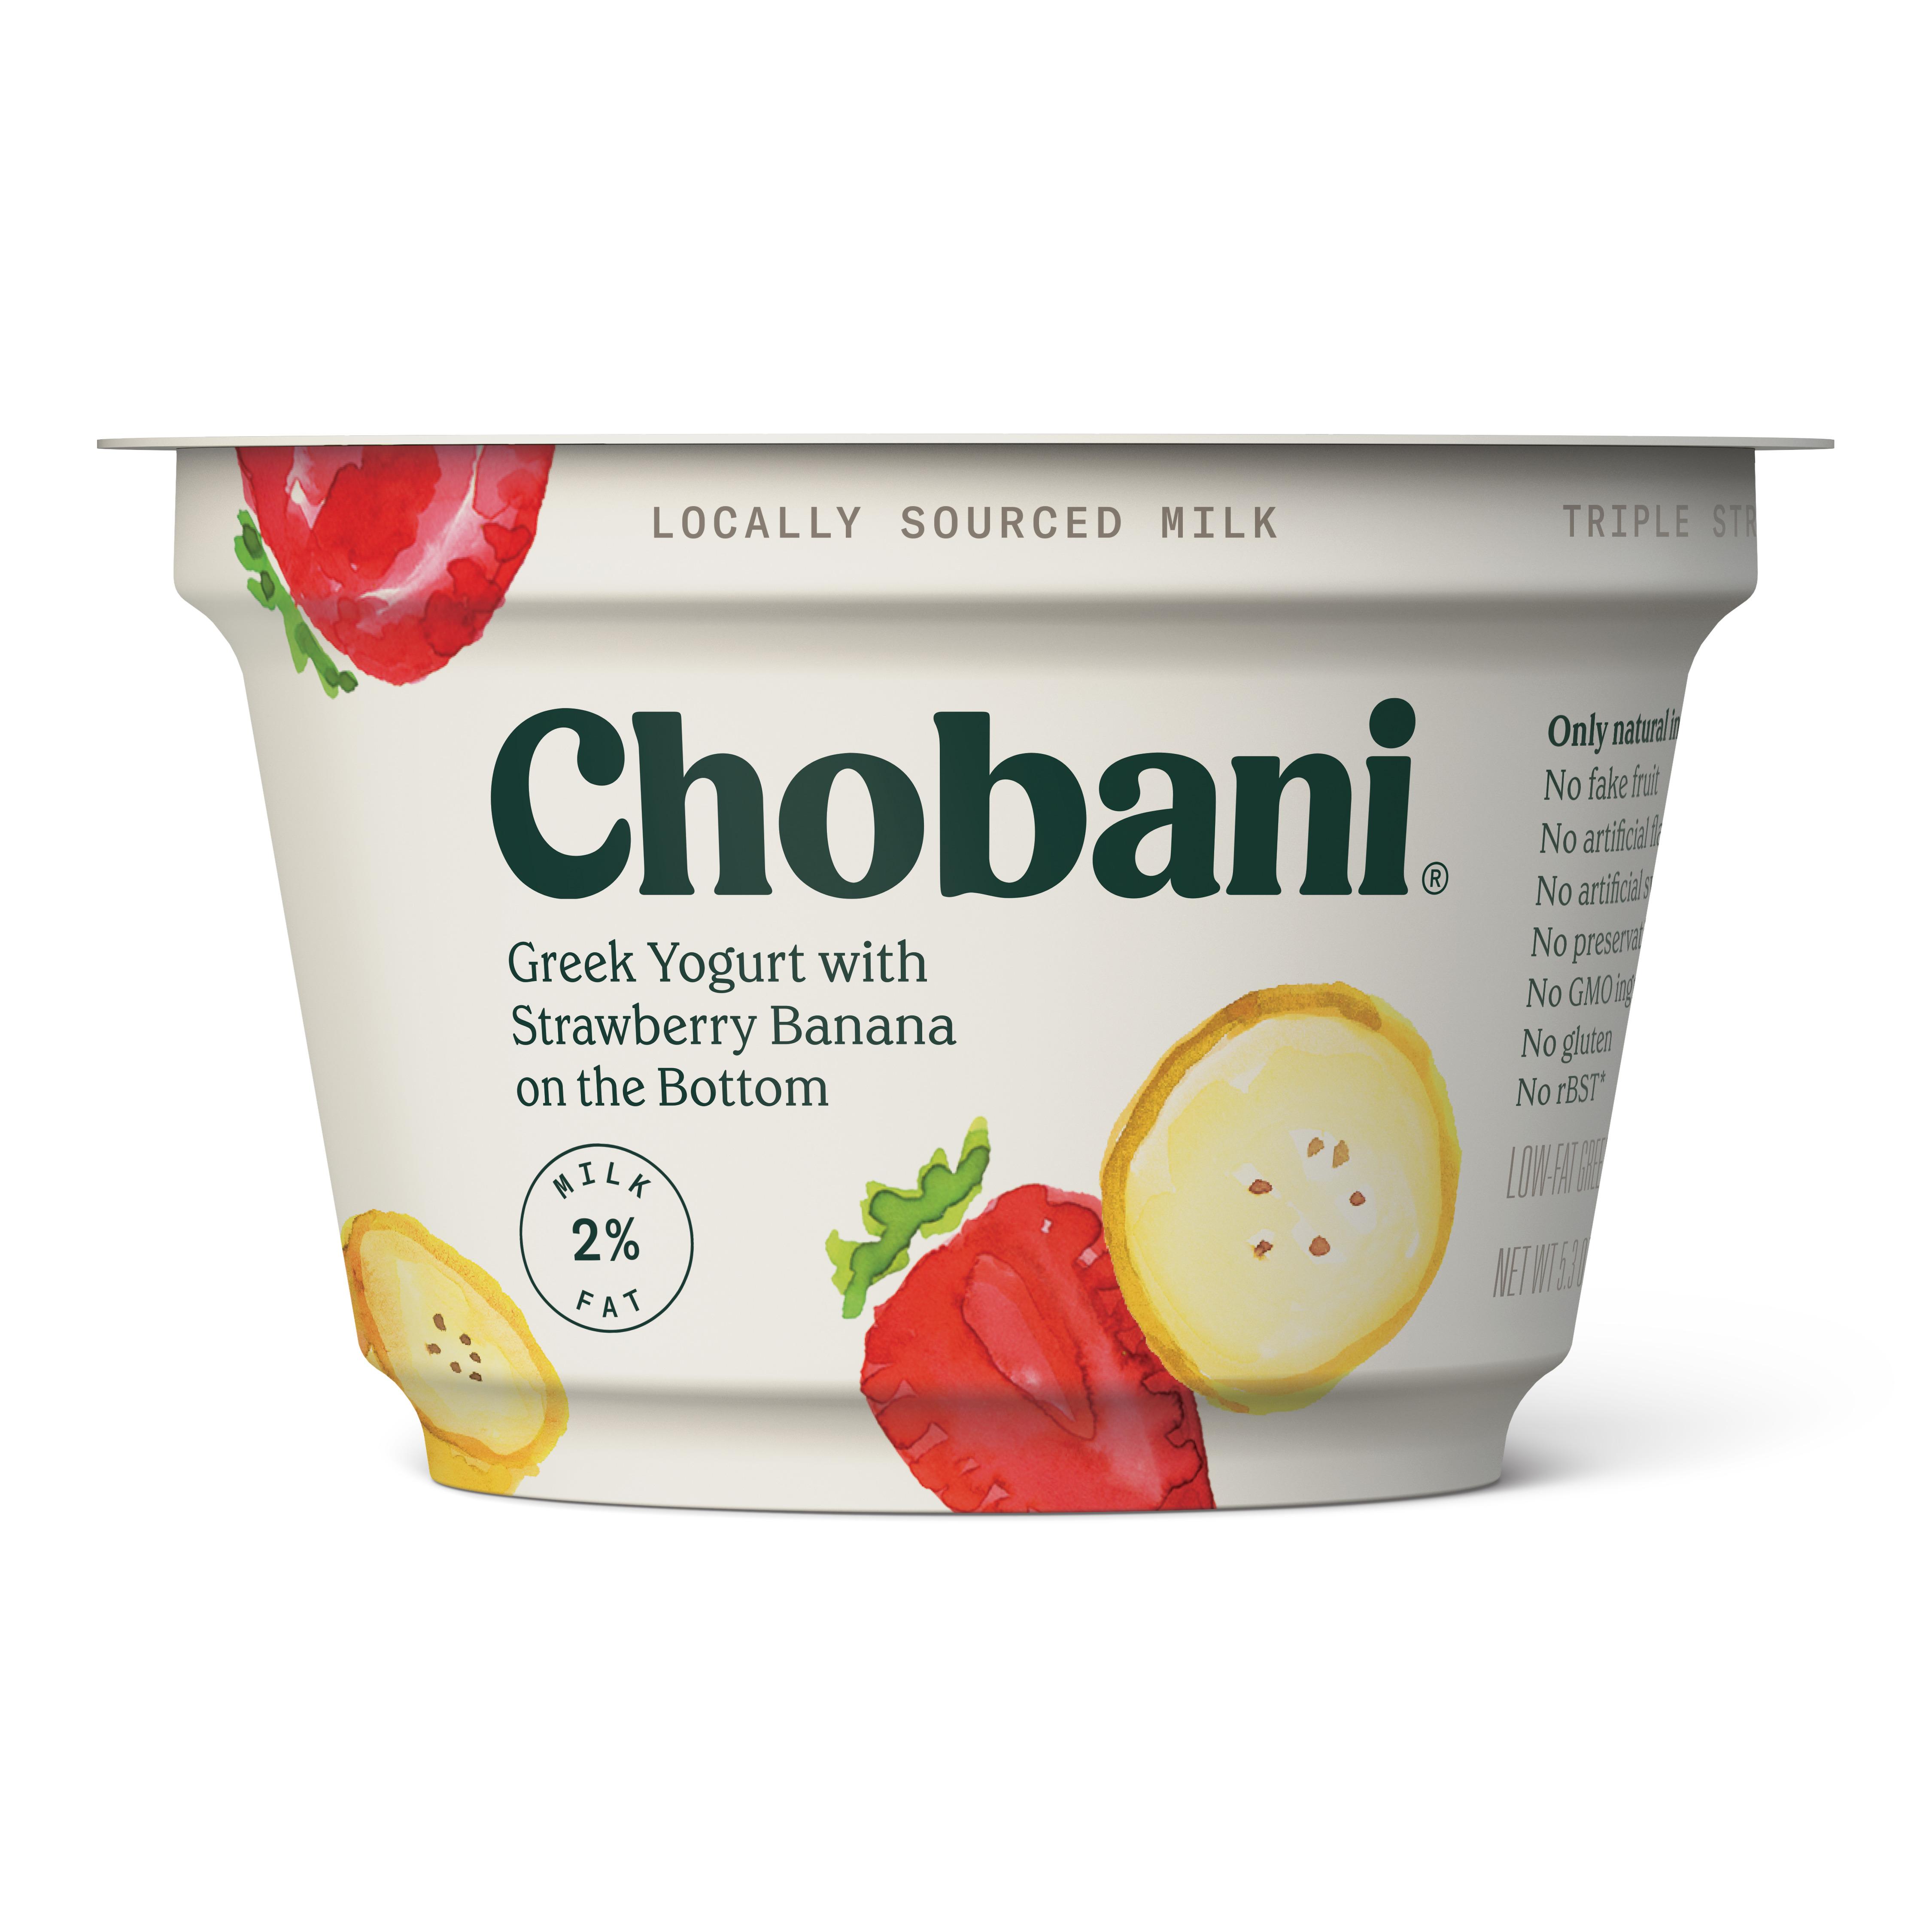 Chobani, Strawberry Banana Fruit on the Bottom Low-Fat Greek Yogurt, 5.3 oz